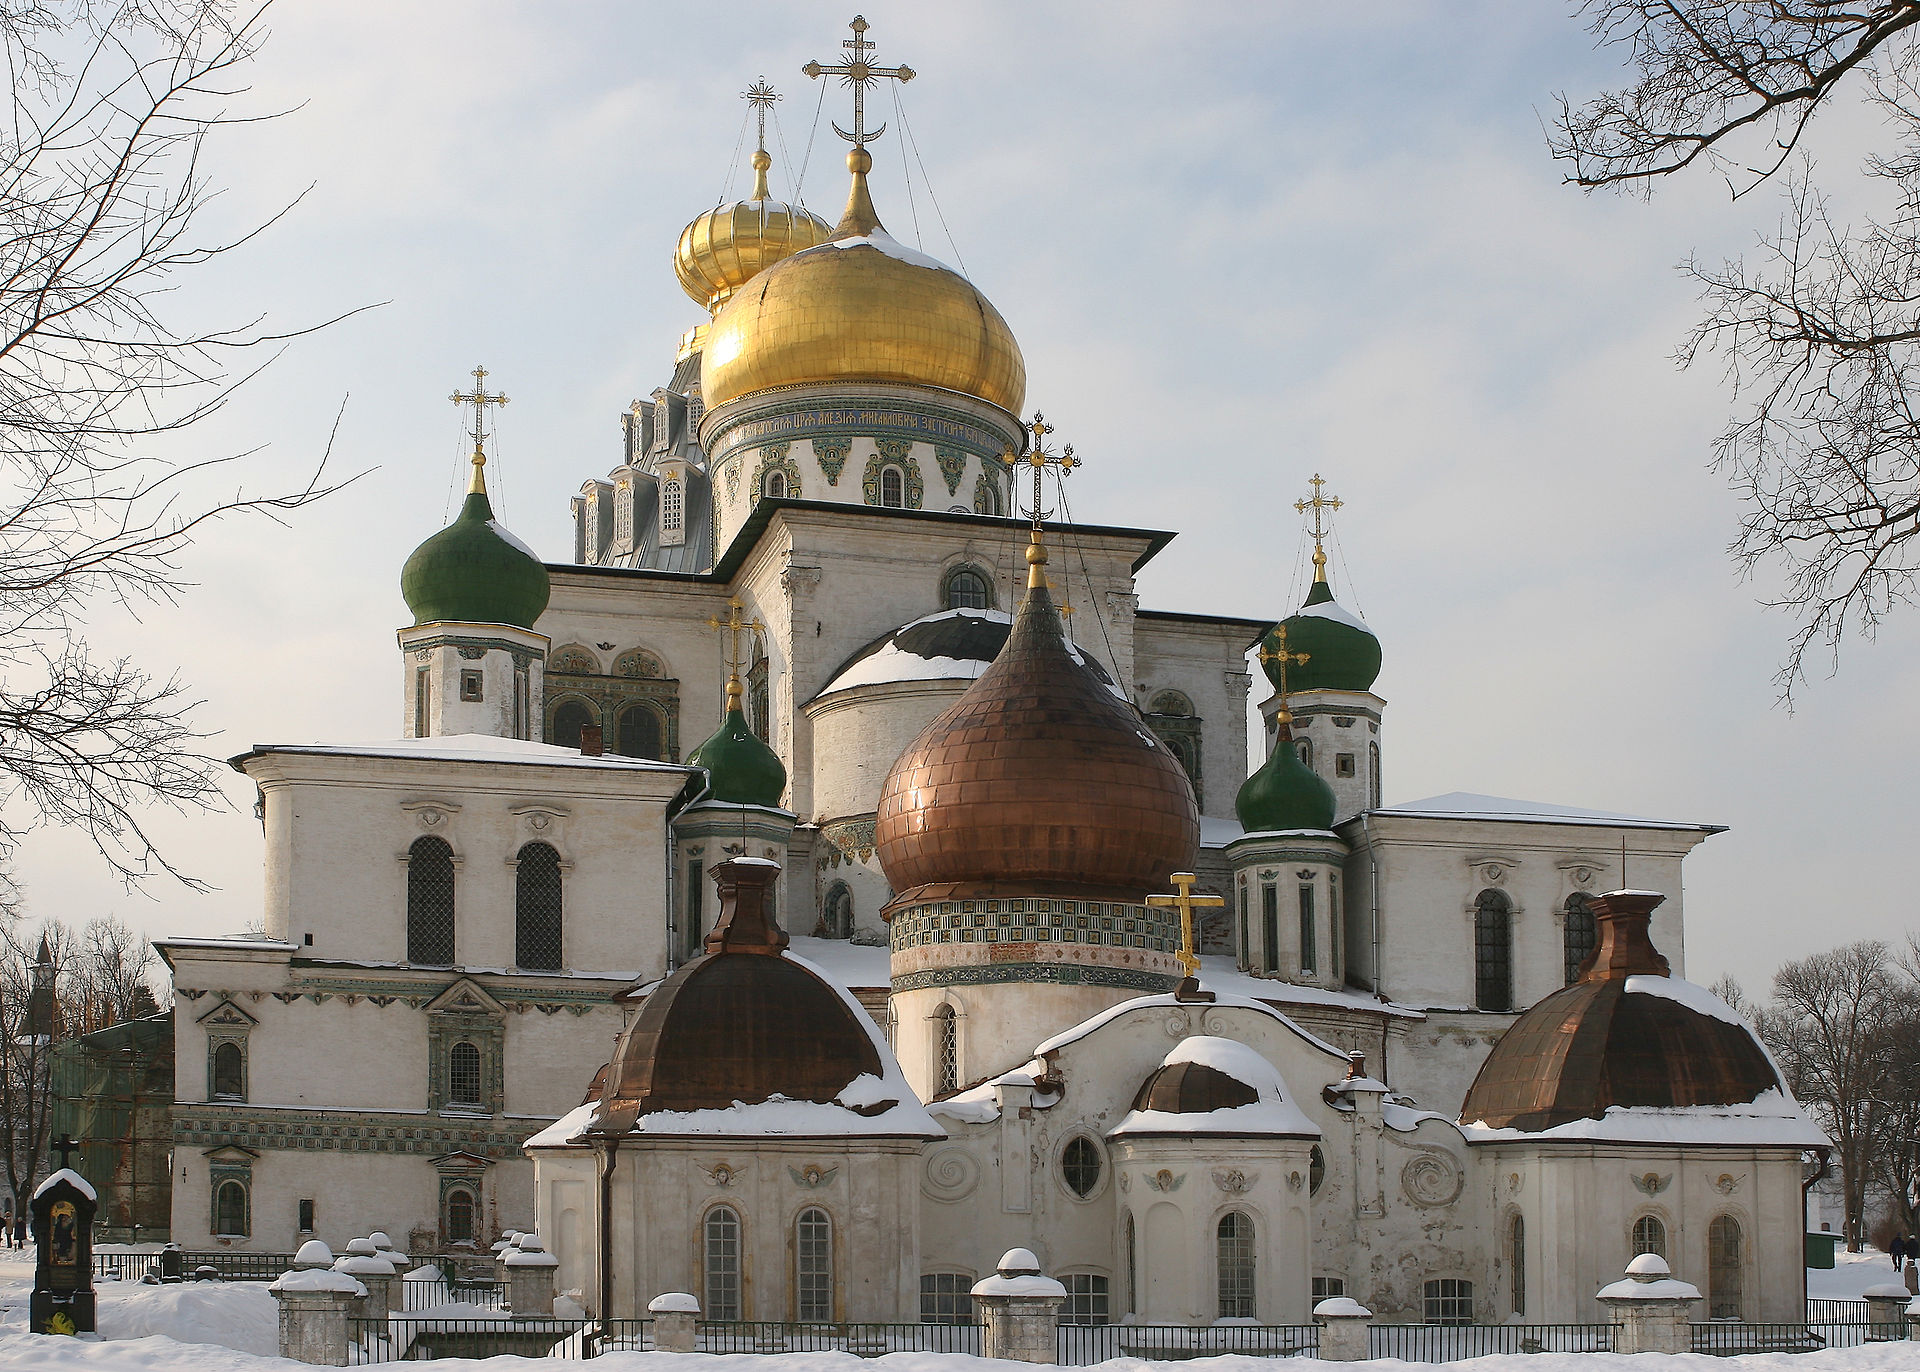 Kloster Neu-Jerusalem – Wikipedia